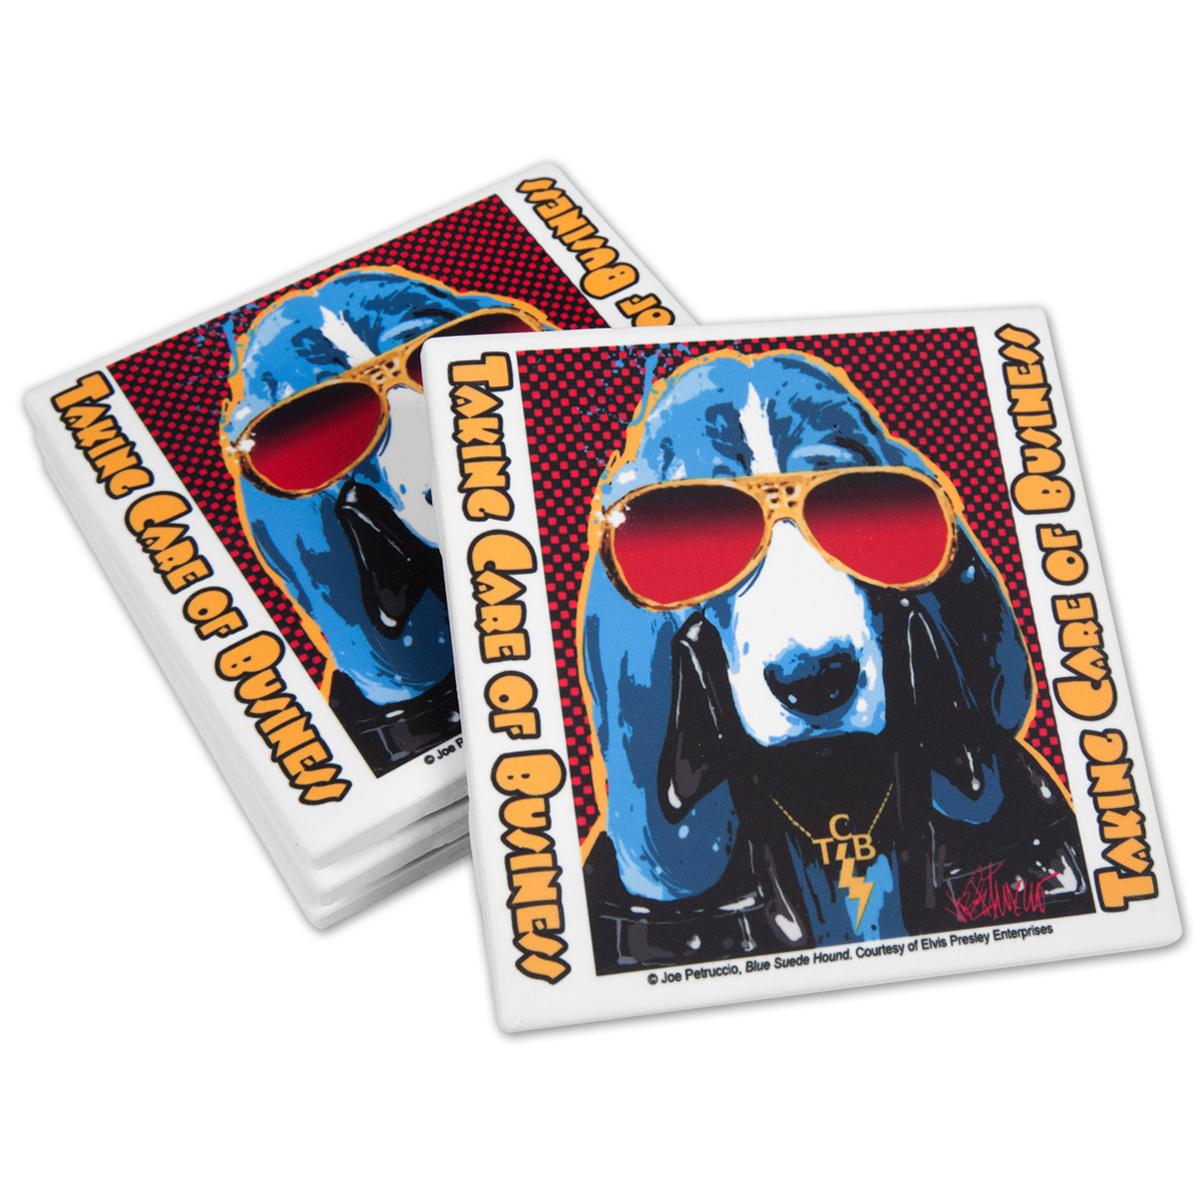 Elvis TCB Hound Ceramic Coasters Set of 4